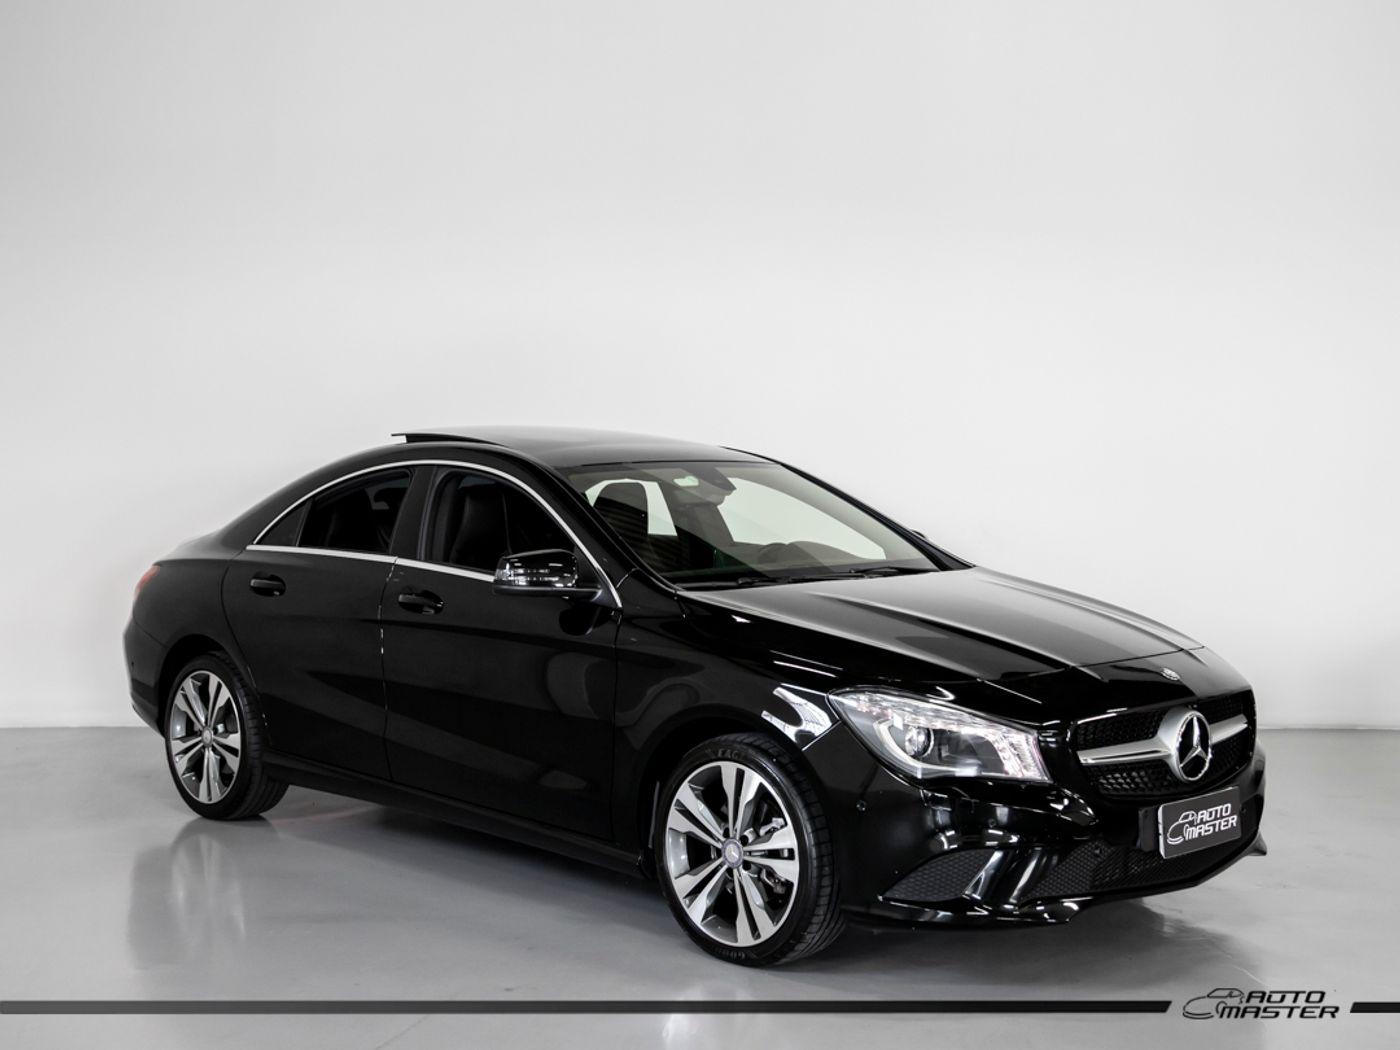 Mercedes CLA-200 Vision 1.6 TB 16V Flex Aut.